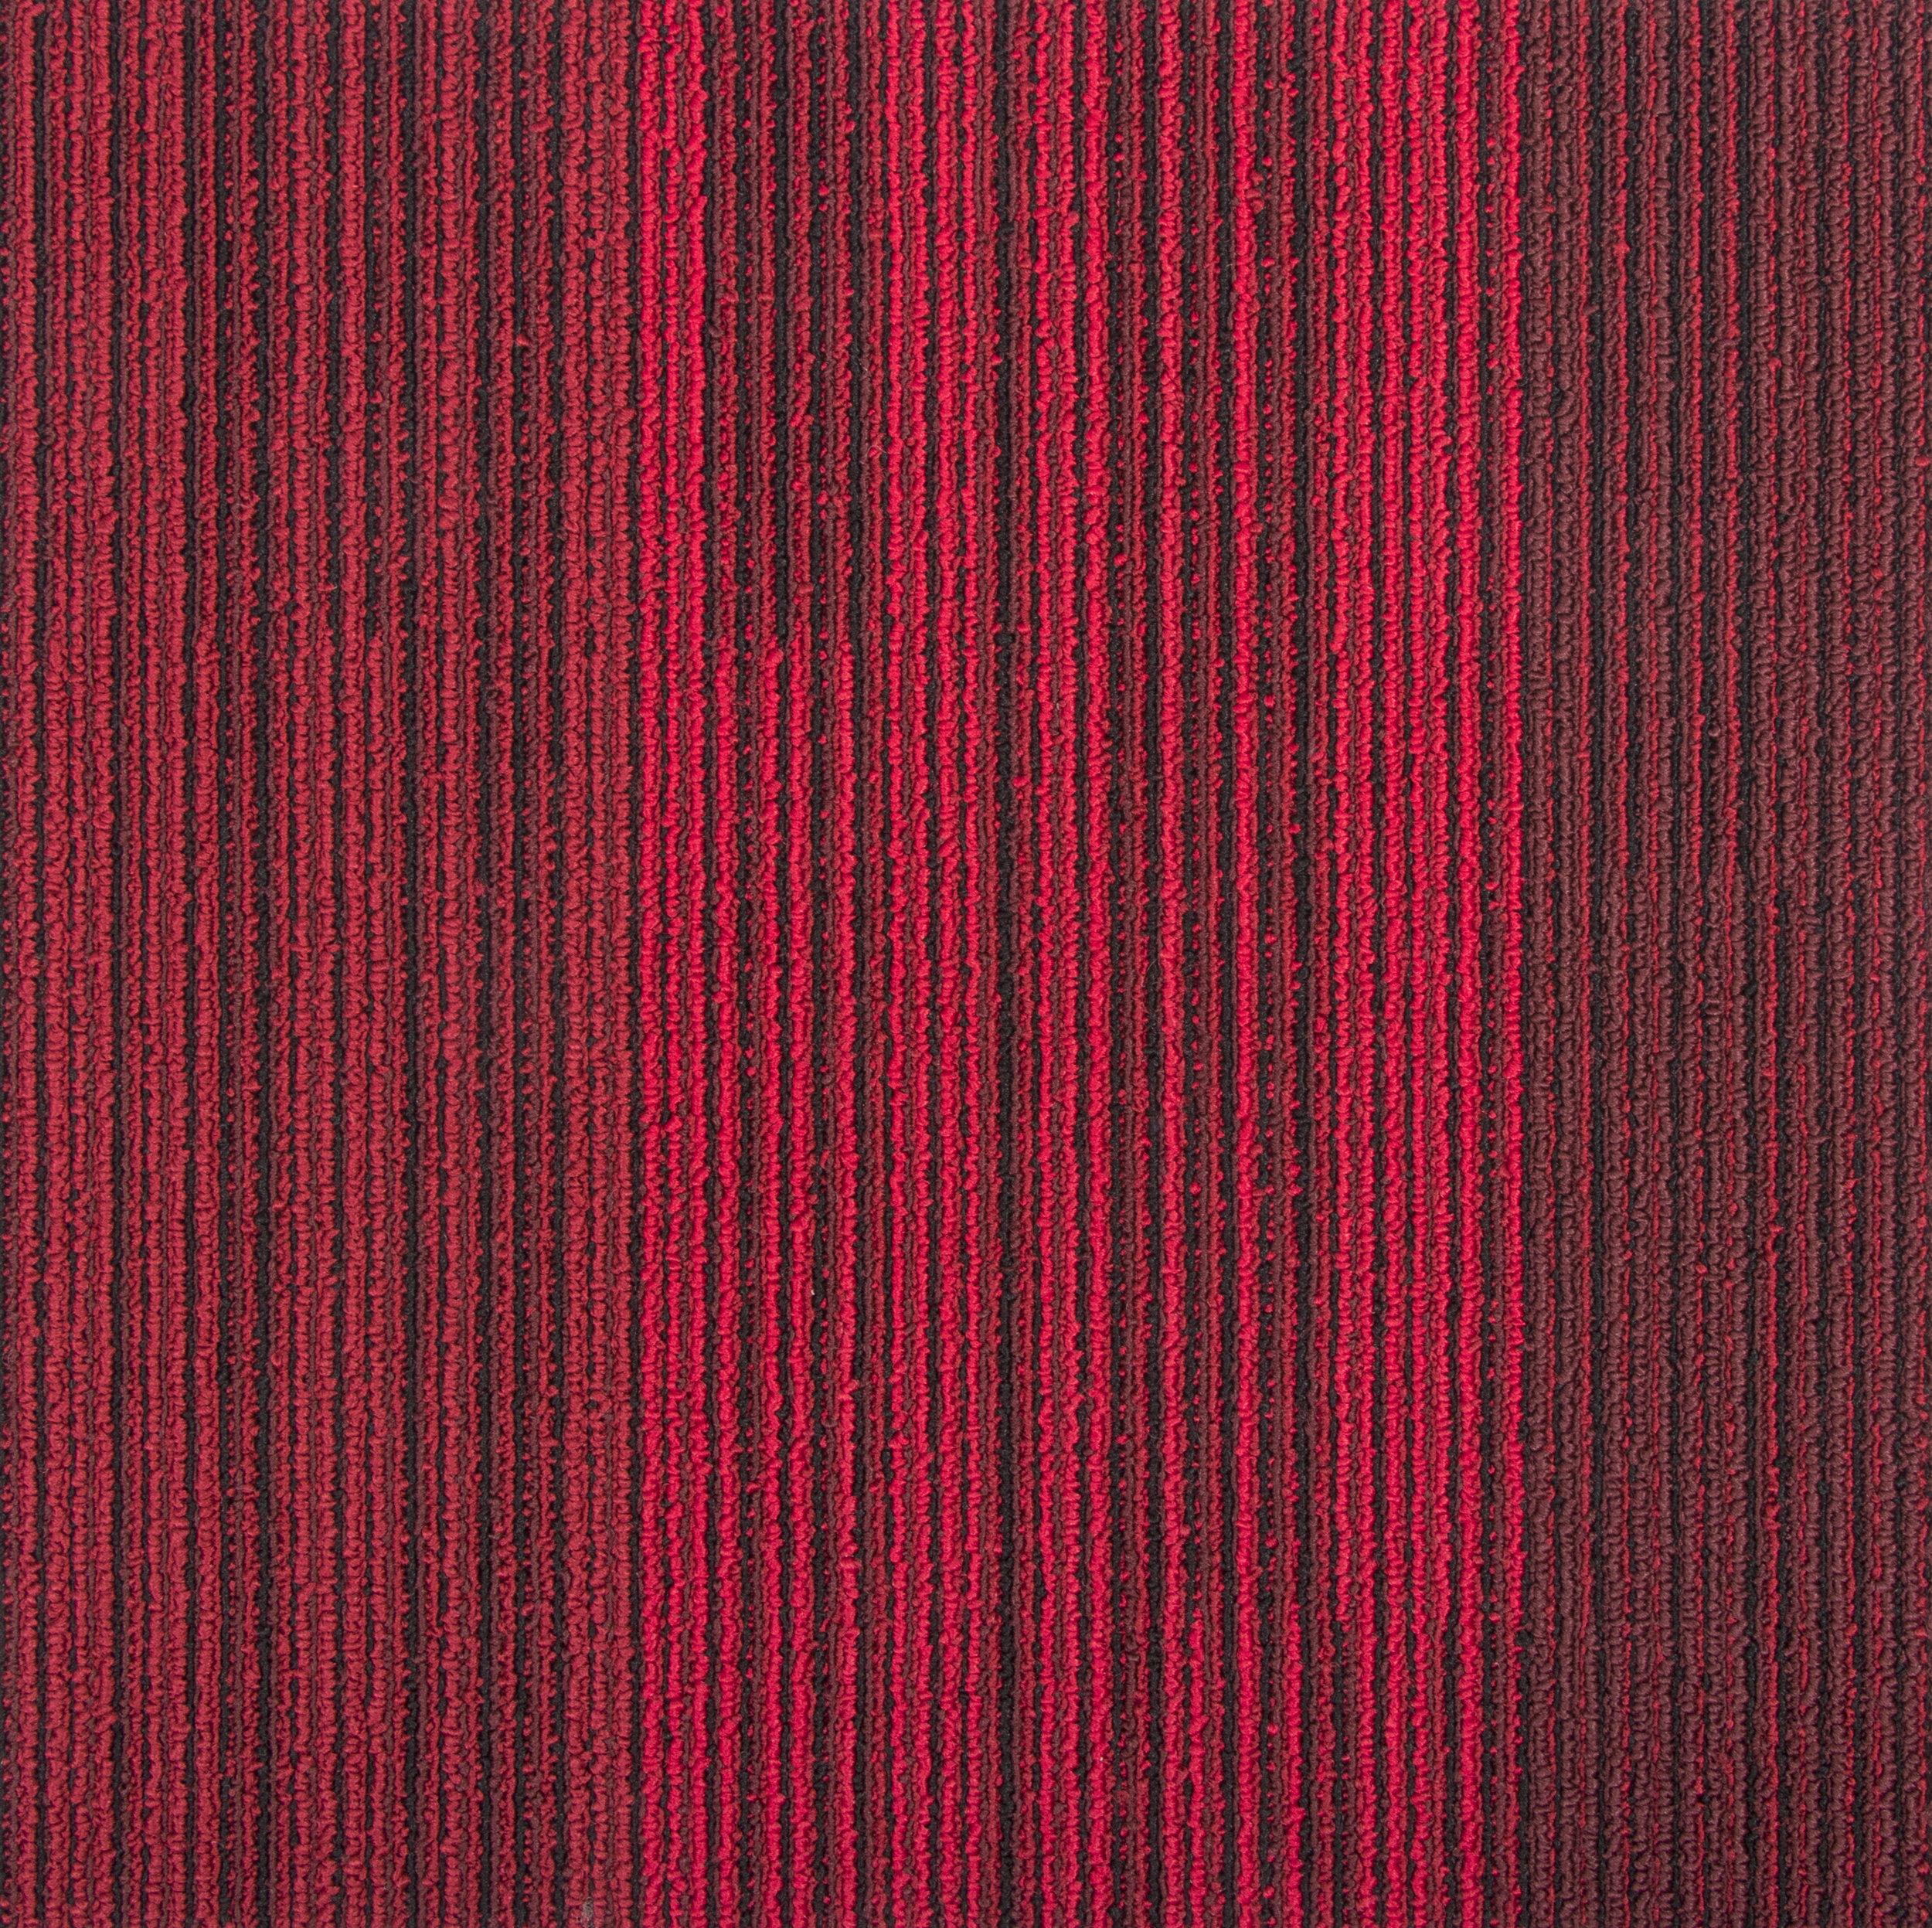 VENETIAN RED — 40063